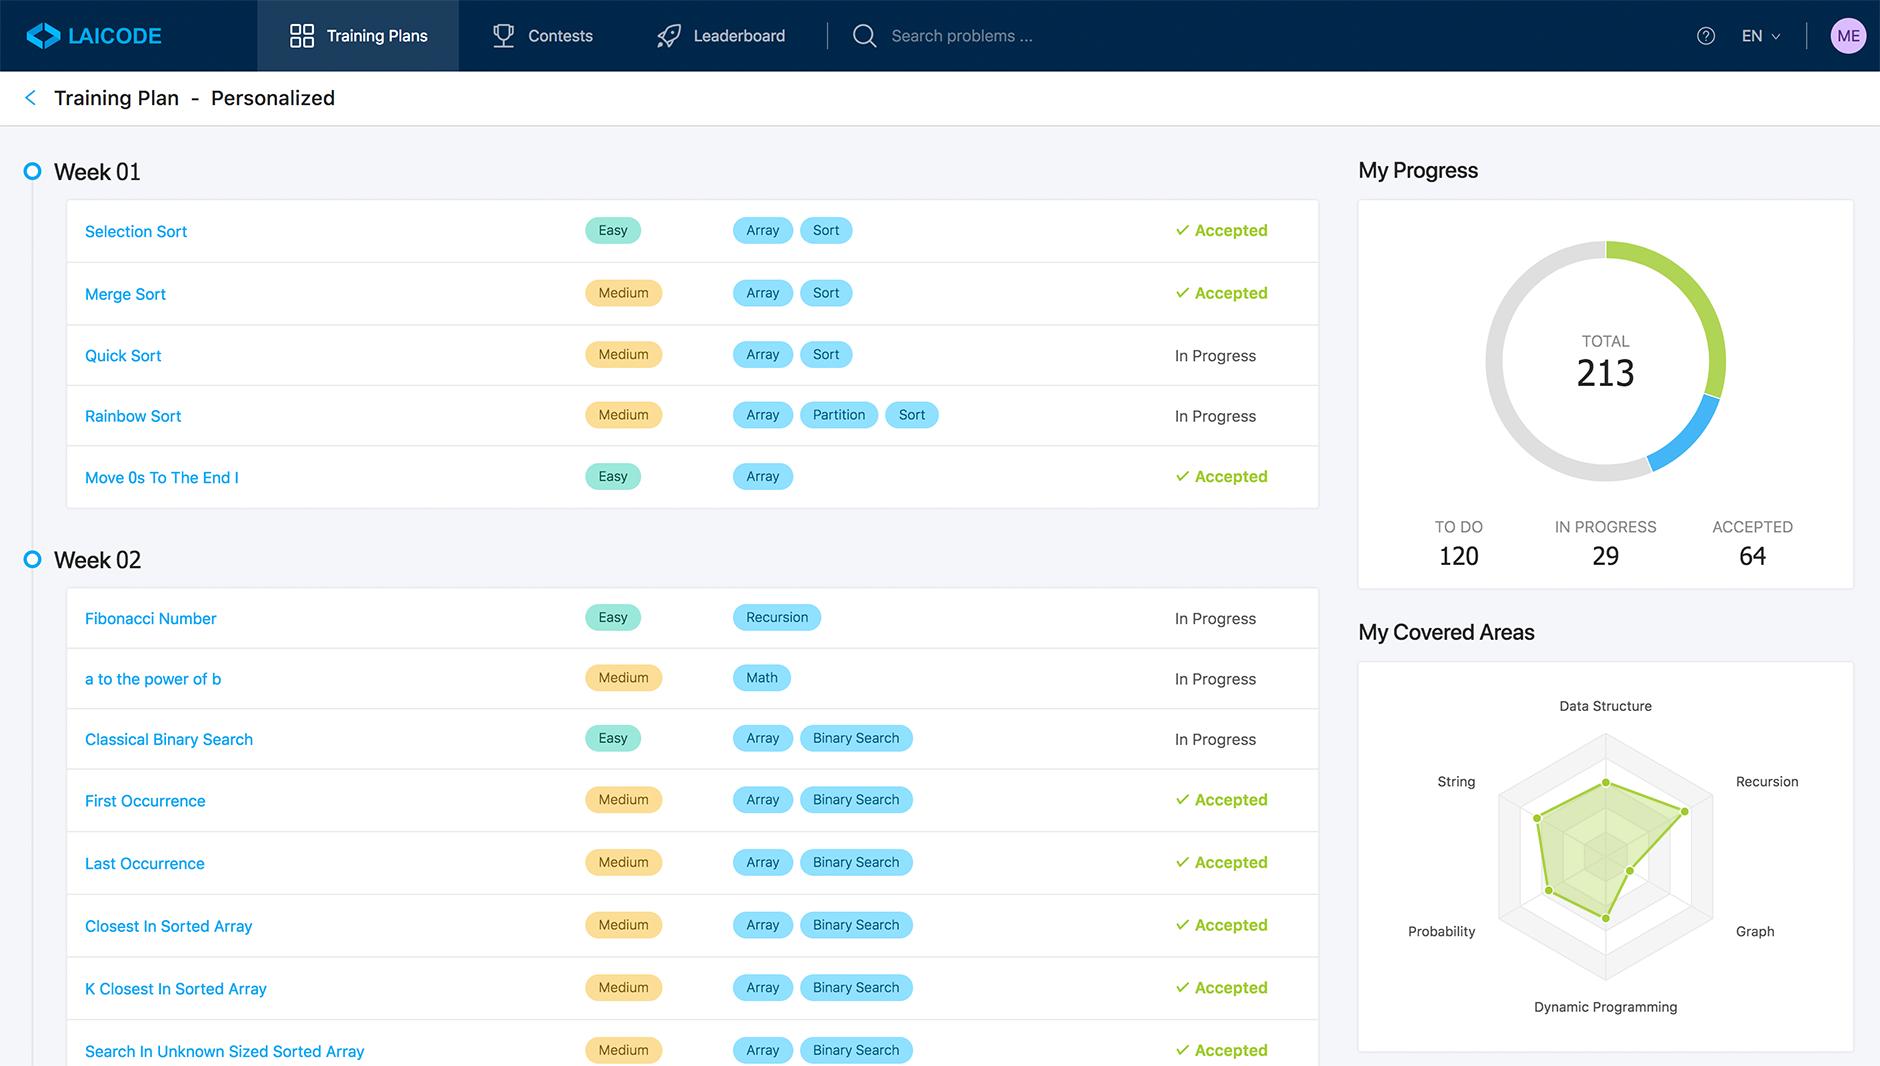 LaiCode training plan screenshot